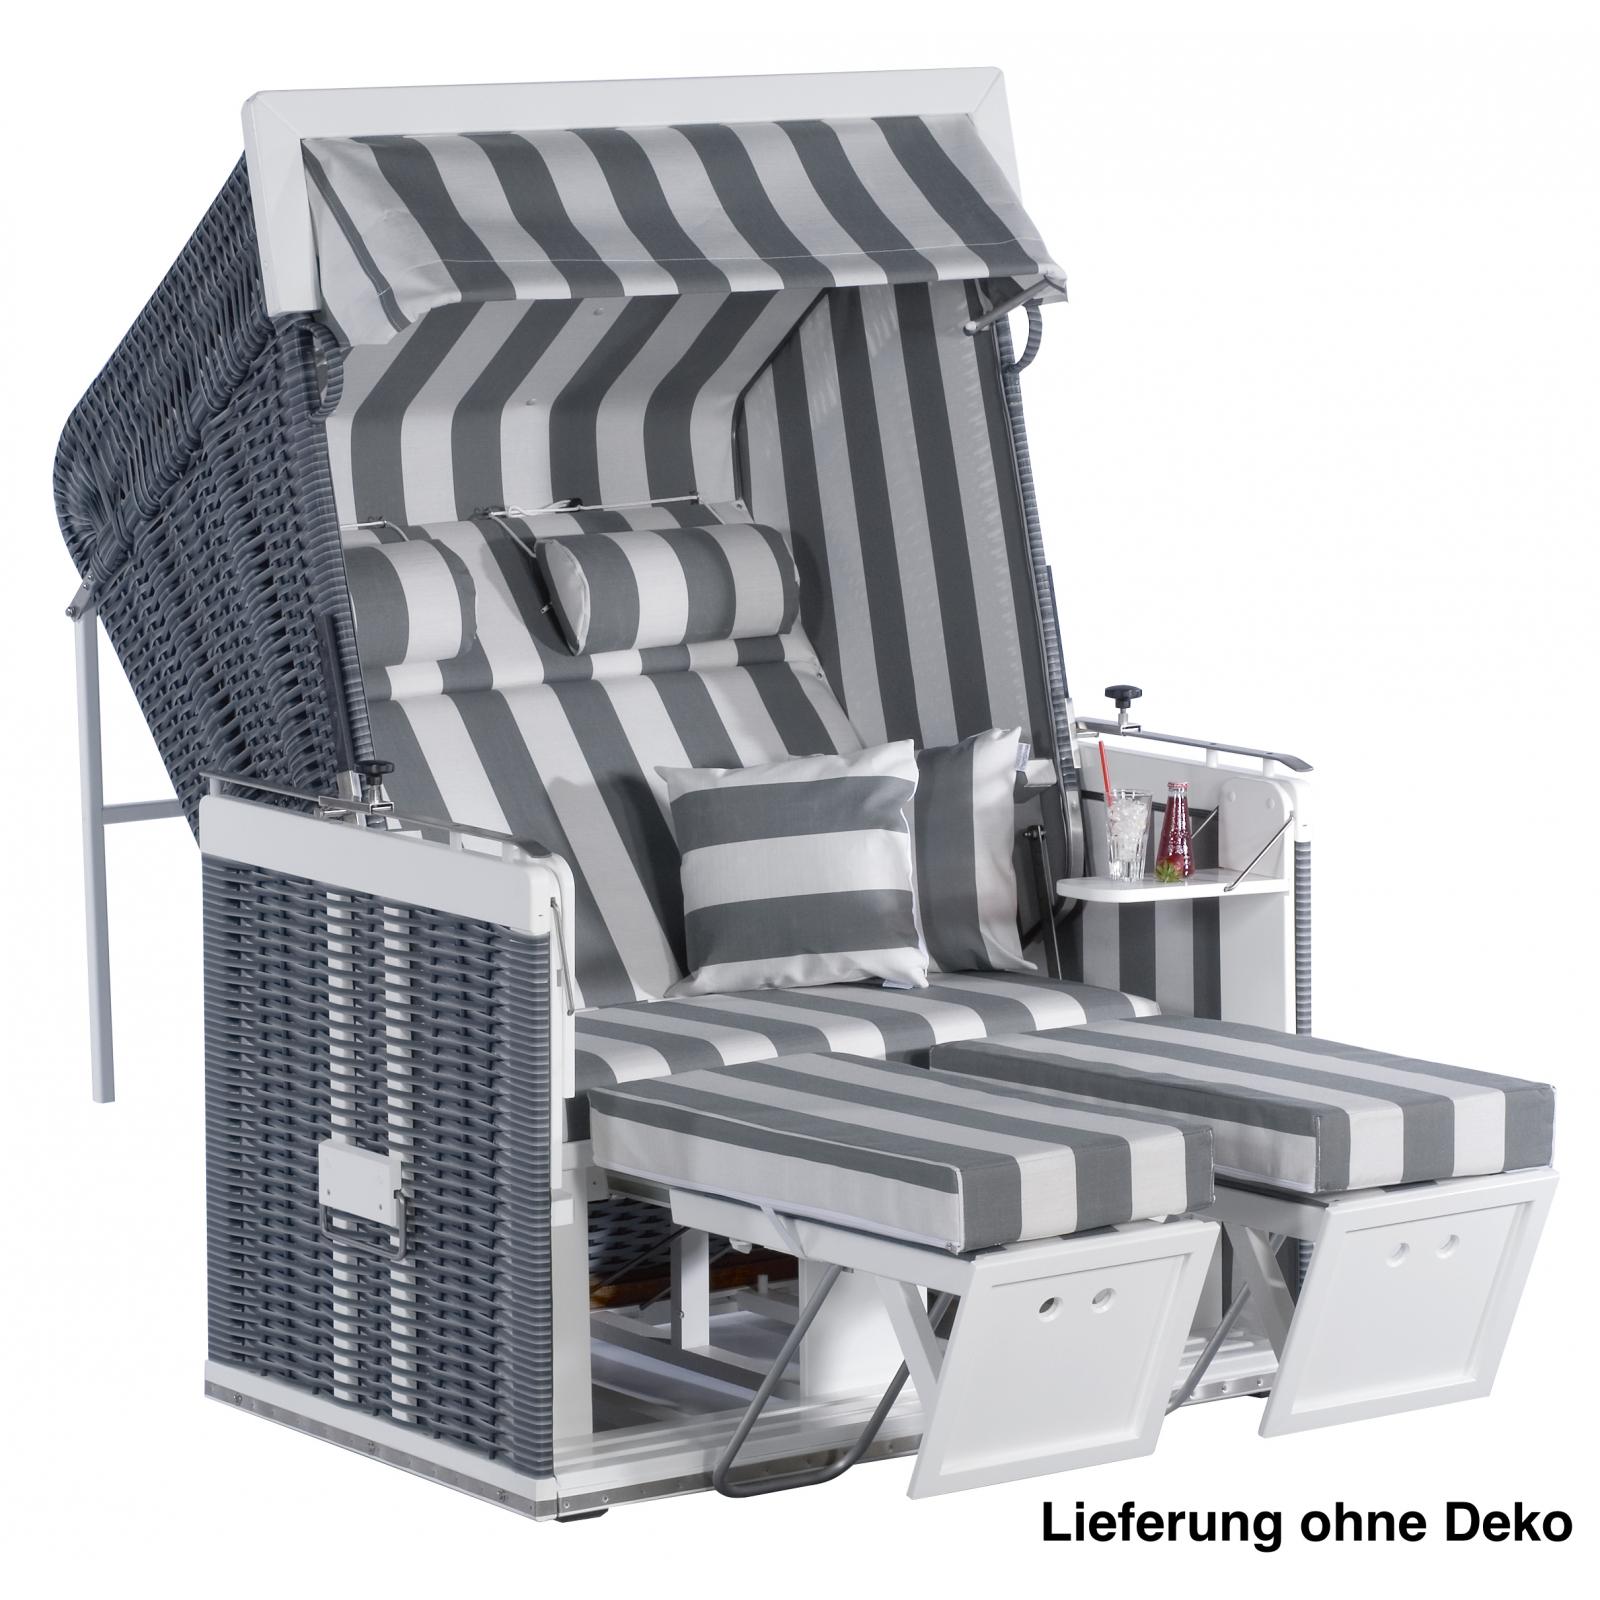 sonnenpartner strandkorb pr sident 2 sitzer liegemodell geflecht onix grau ebay. Black Bedroom Furniture Sets. Home Design Ideas